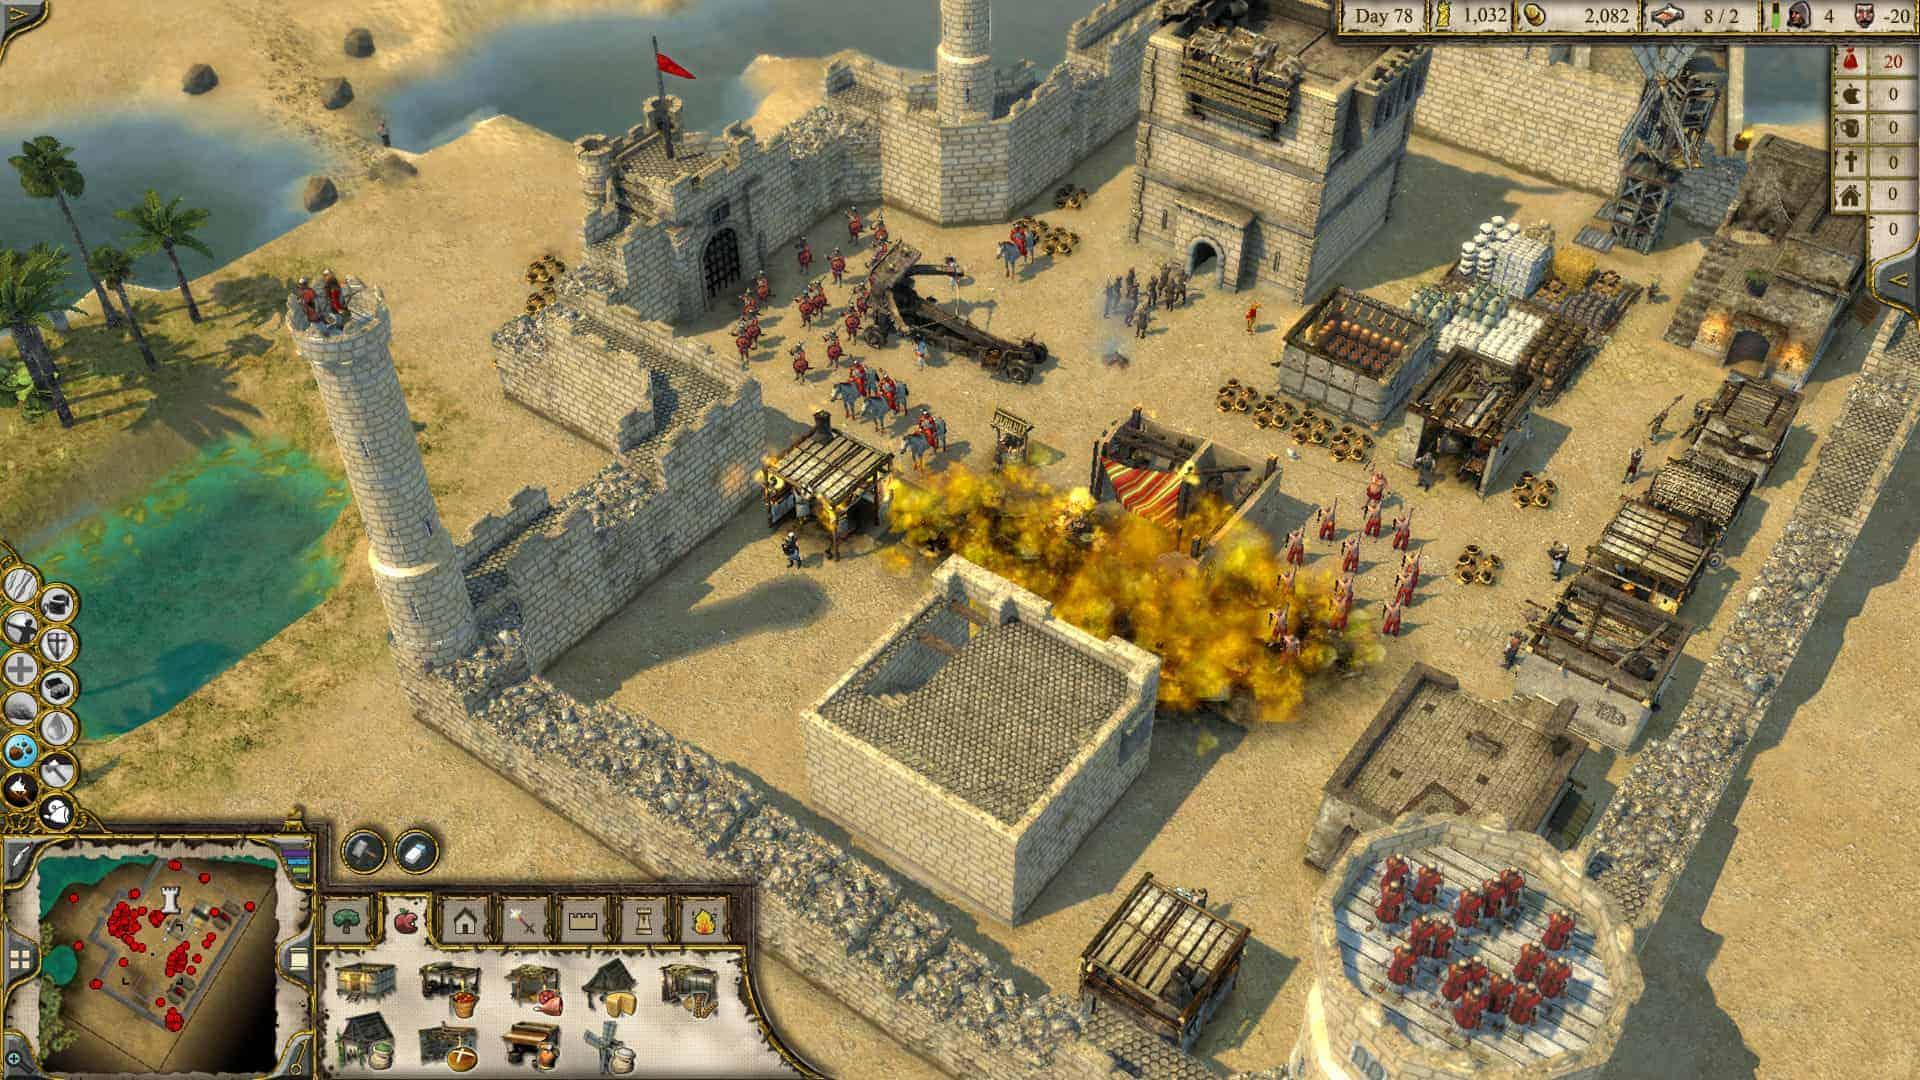 stronghold crusader 2 game setup free download